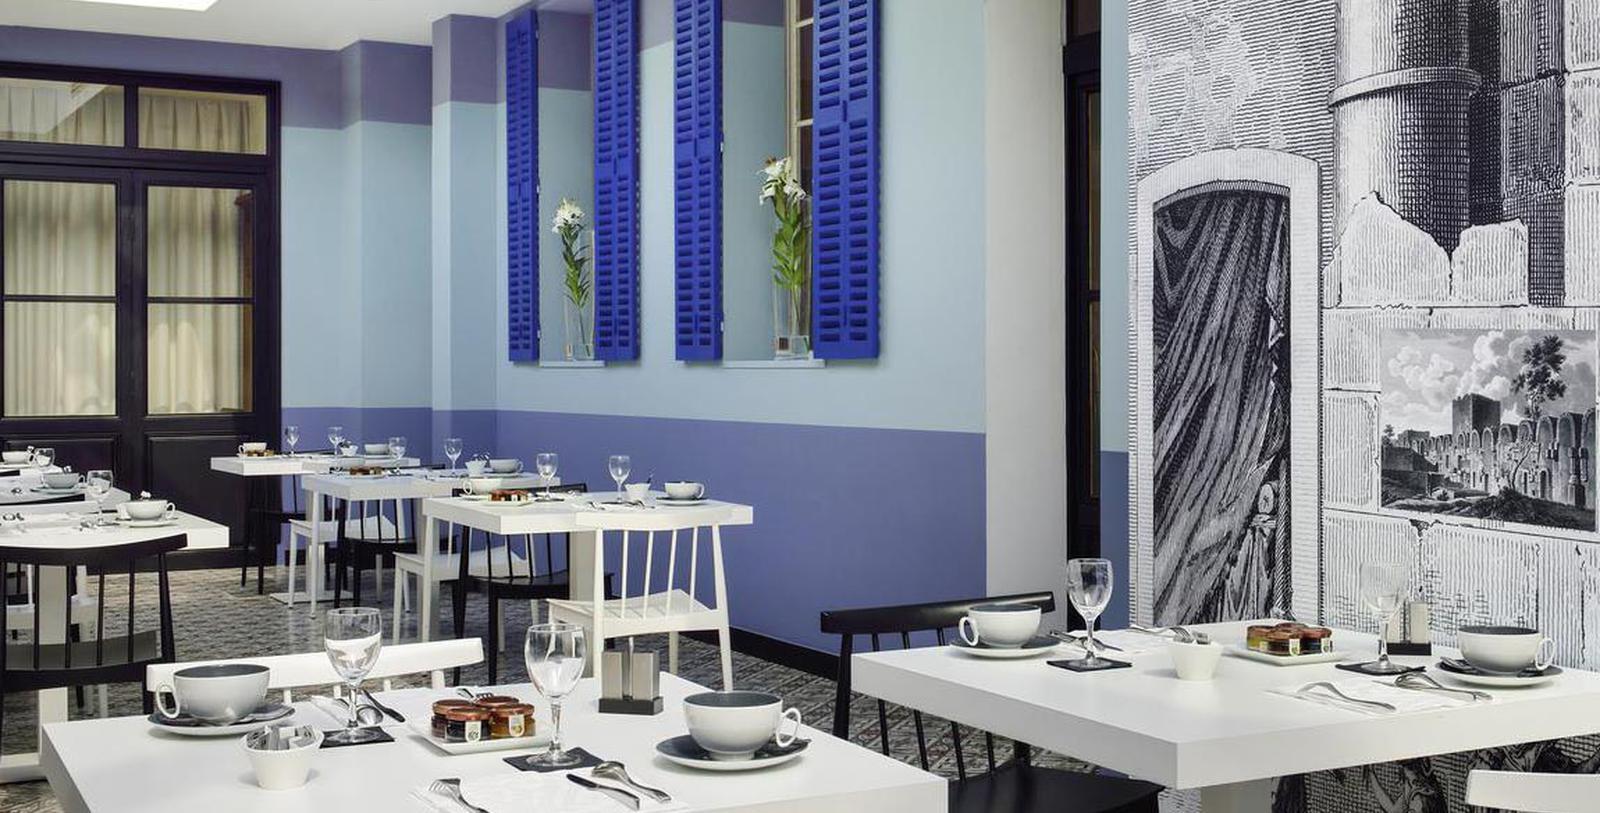 Image of Dining Area Hôtel & Spa Jules César Arles – MGallery by Sofitel, 1661, Member of Historic Hotels Worldwide, in Arles, France, Taste